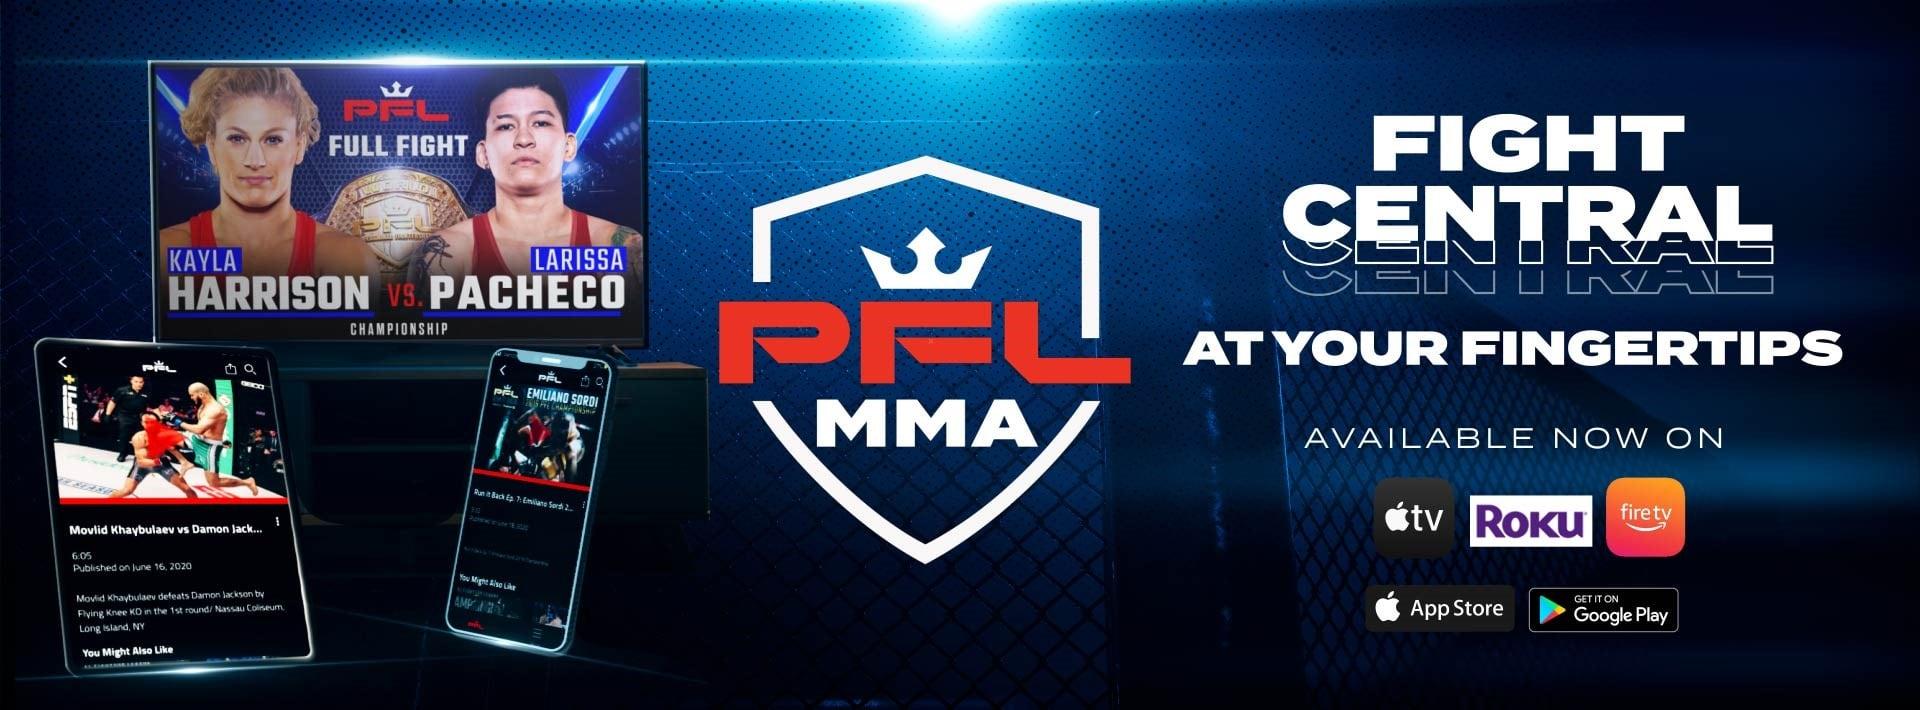 PFL OTT Imagery - MMA Fight Coverage